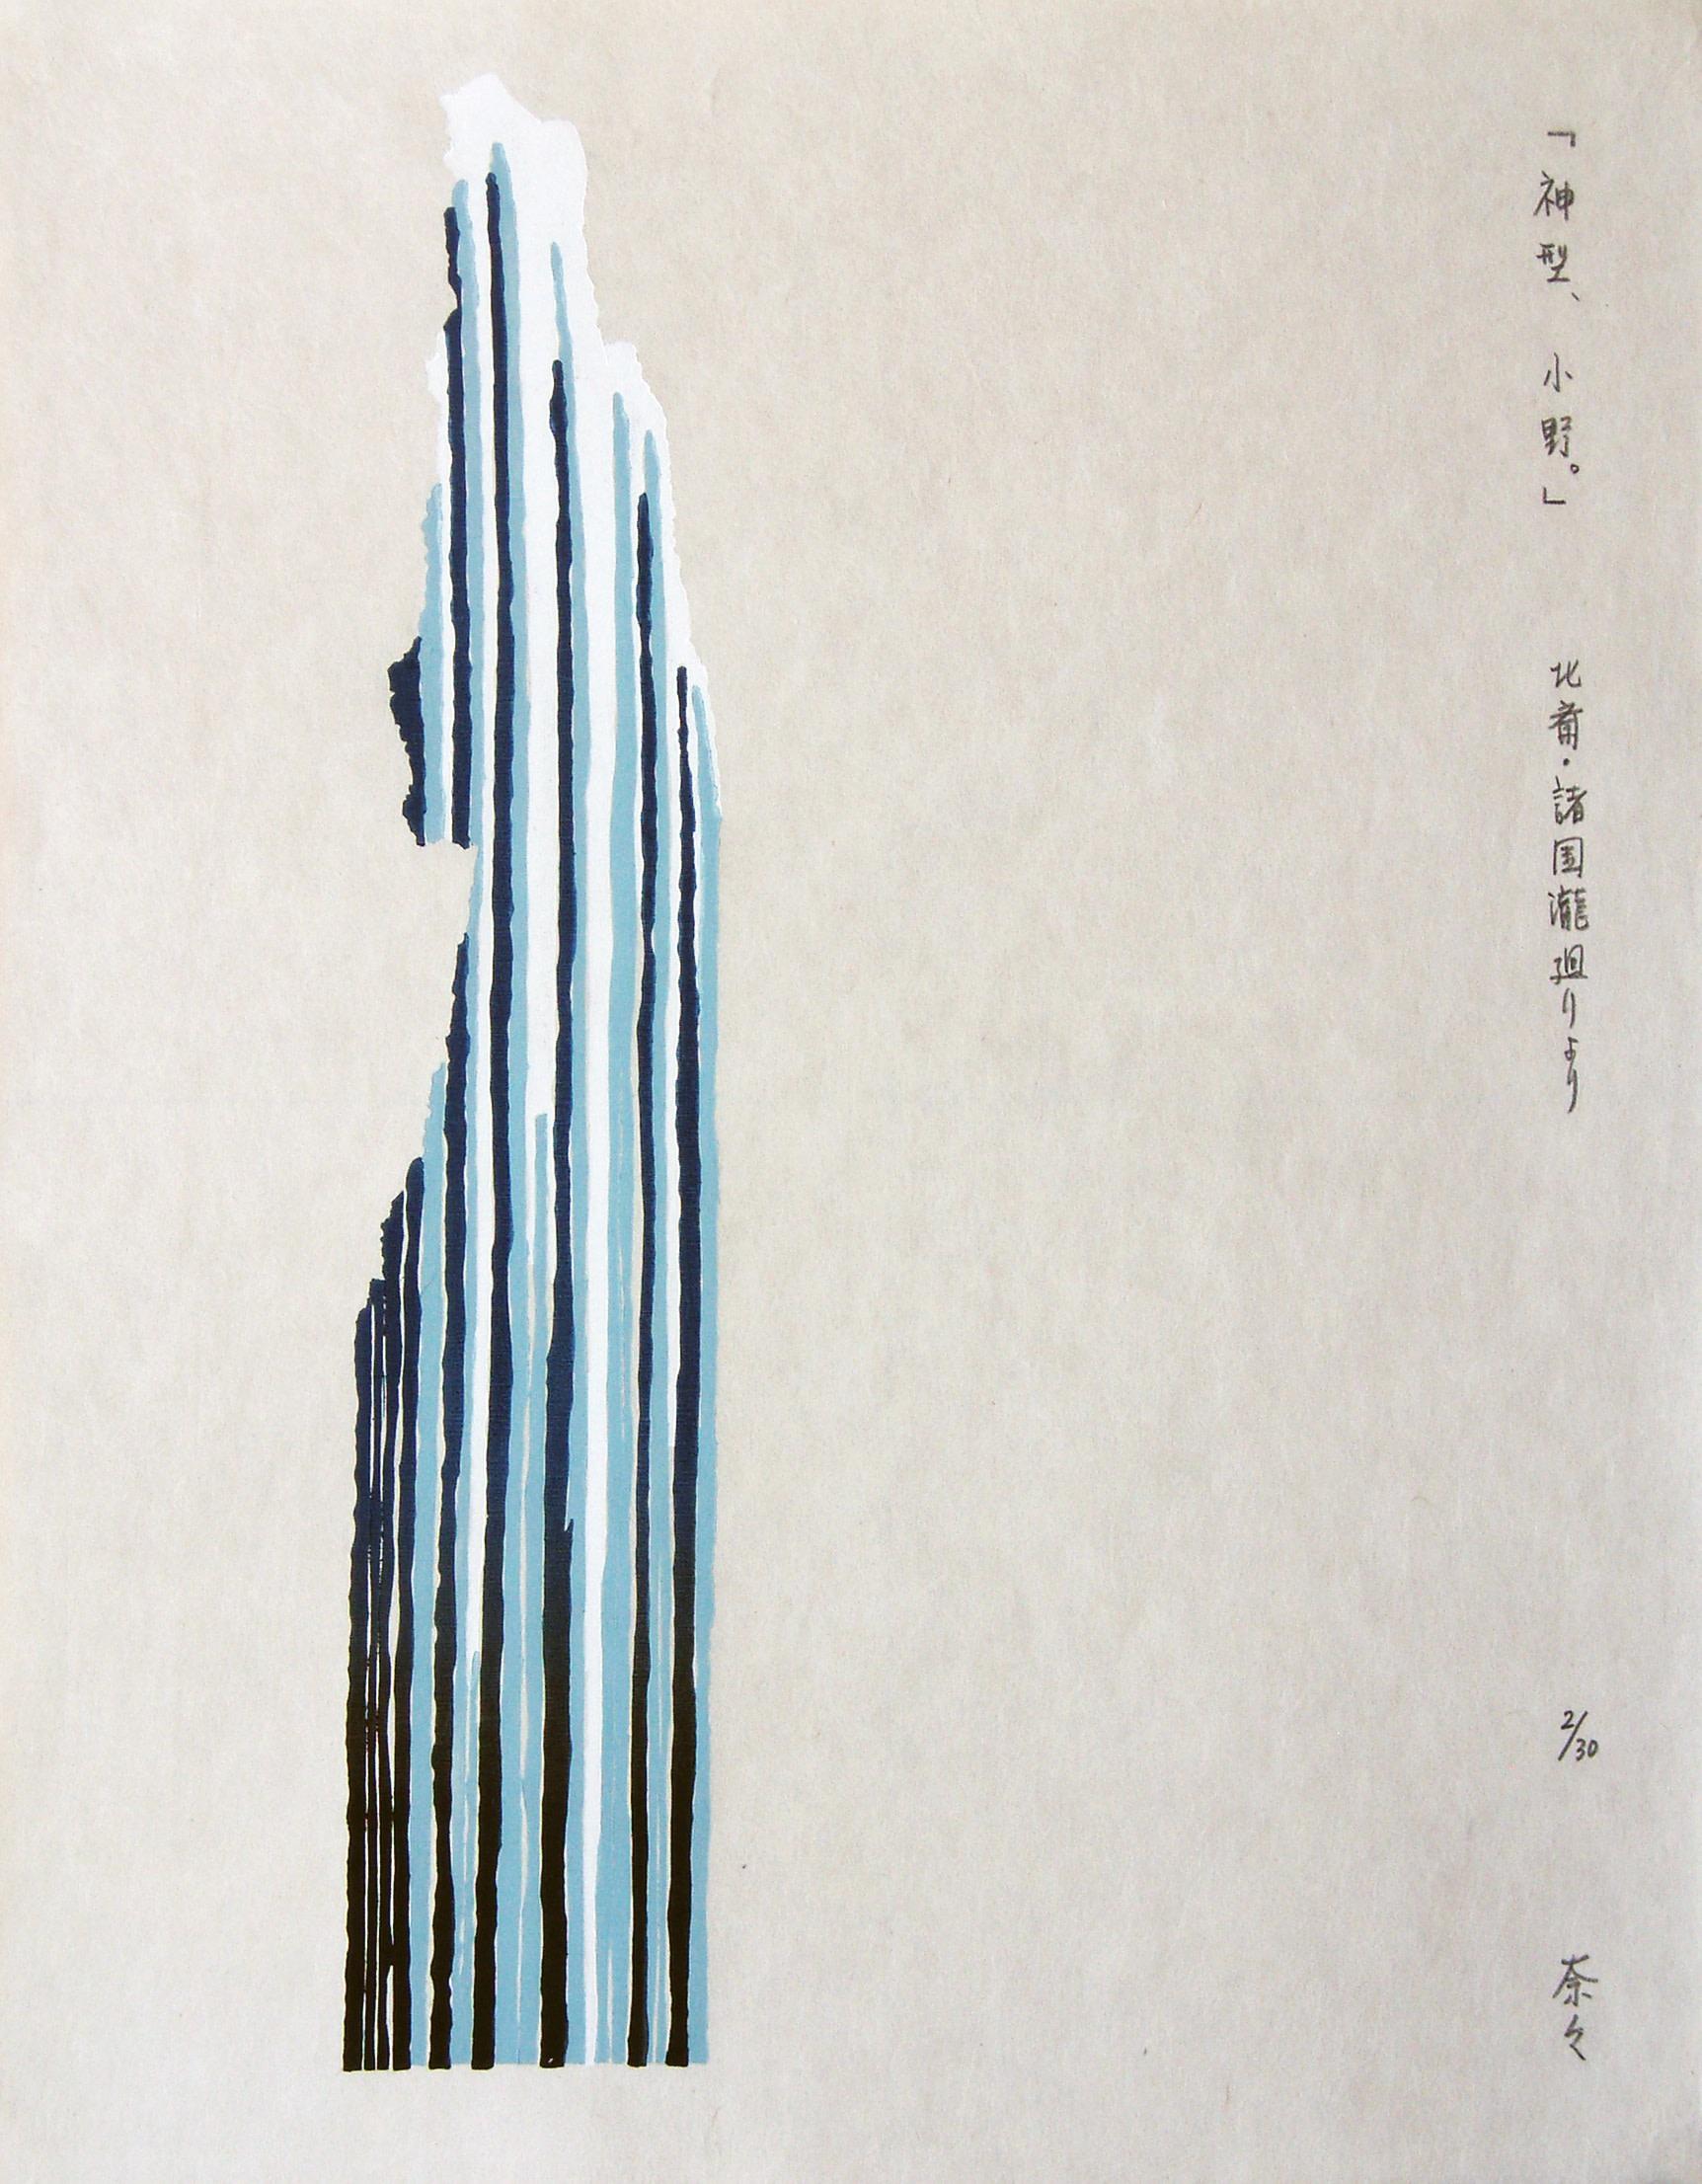 "<span class=""link fancybox-details-link""><a href=""/exhibitions/21/works/artworks_standalone10889/"">View Detail Page</a></span><div class=""artist""><span class=""artist""><strong>Nana Shiomi RE</strong></span></div><div class=""title""><em>Shape of God, Ono From Hokusai</em></div><div class=""medium"">woodcut</div><div class=""dimensions"">70 x 57cm framed<br>64 x 50cm unframed</div><div class=""edition_details"">edition of 30</div>"